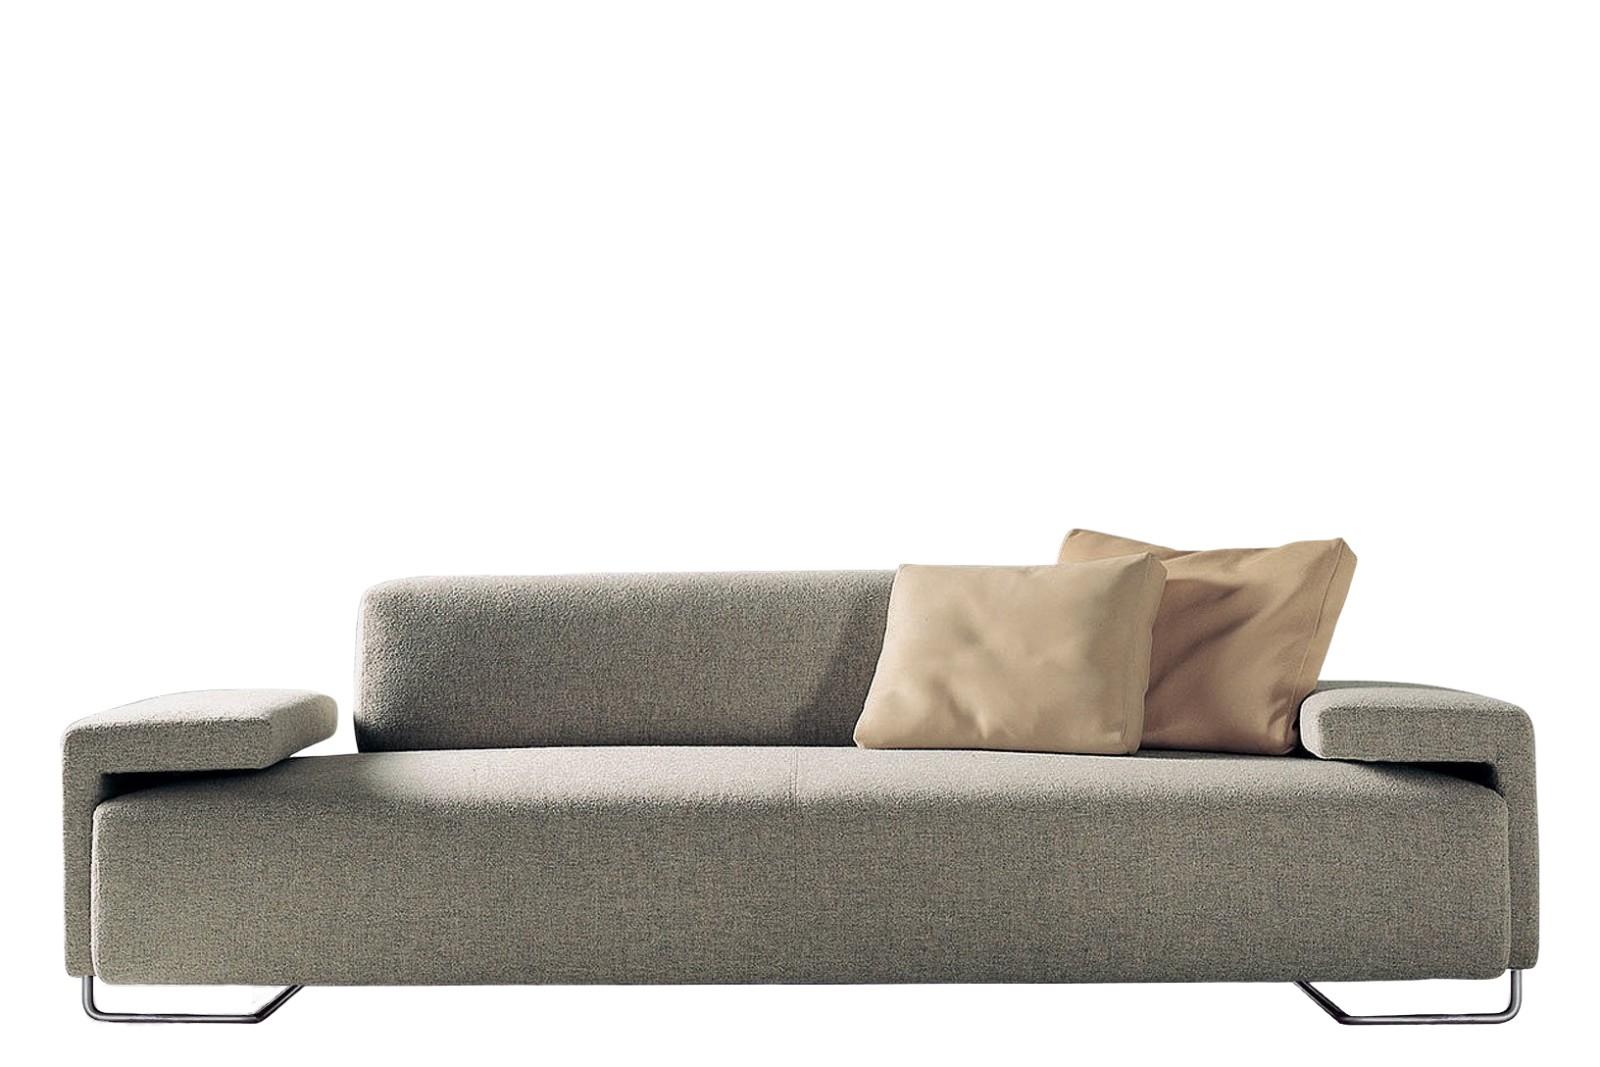 Lowland 3 Seater Sofa B0211 - Leather Oil cirè, Oxidored Feet